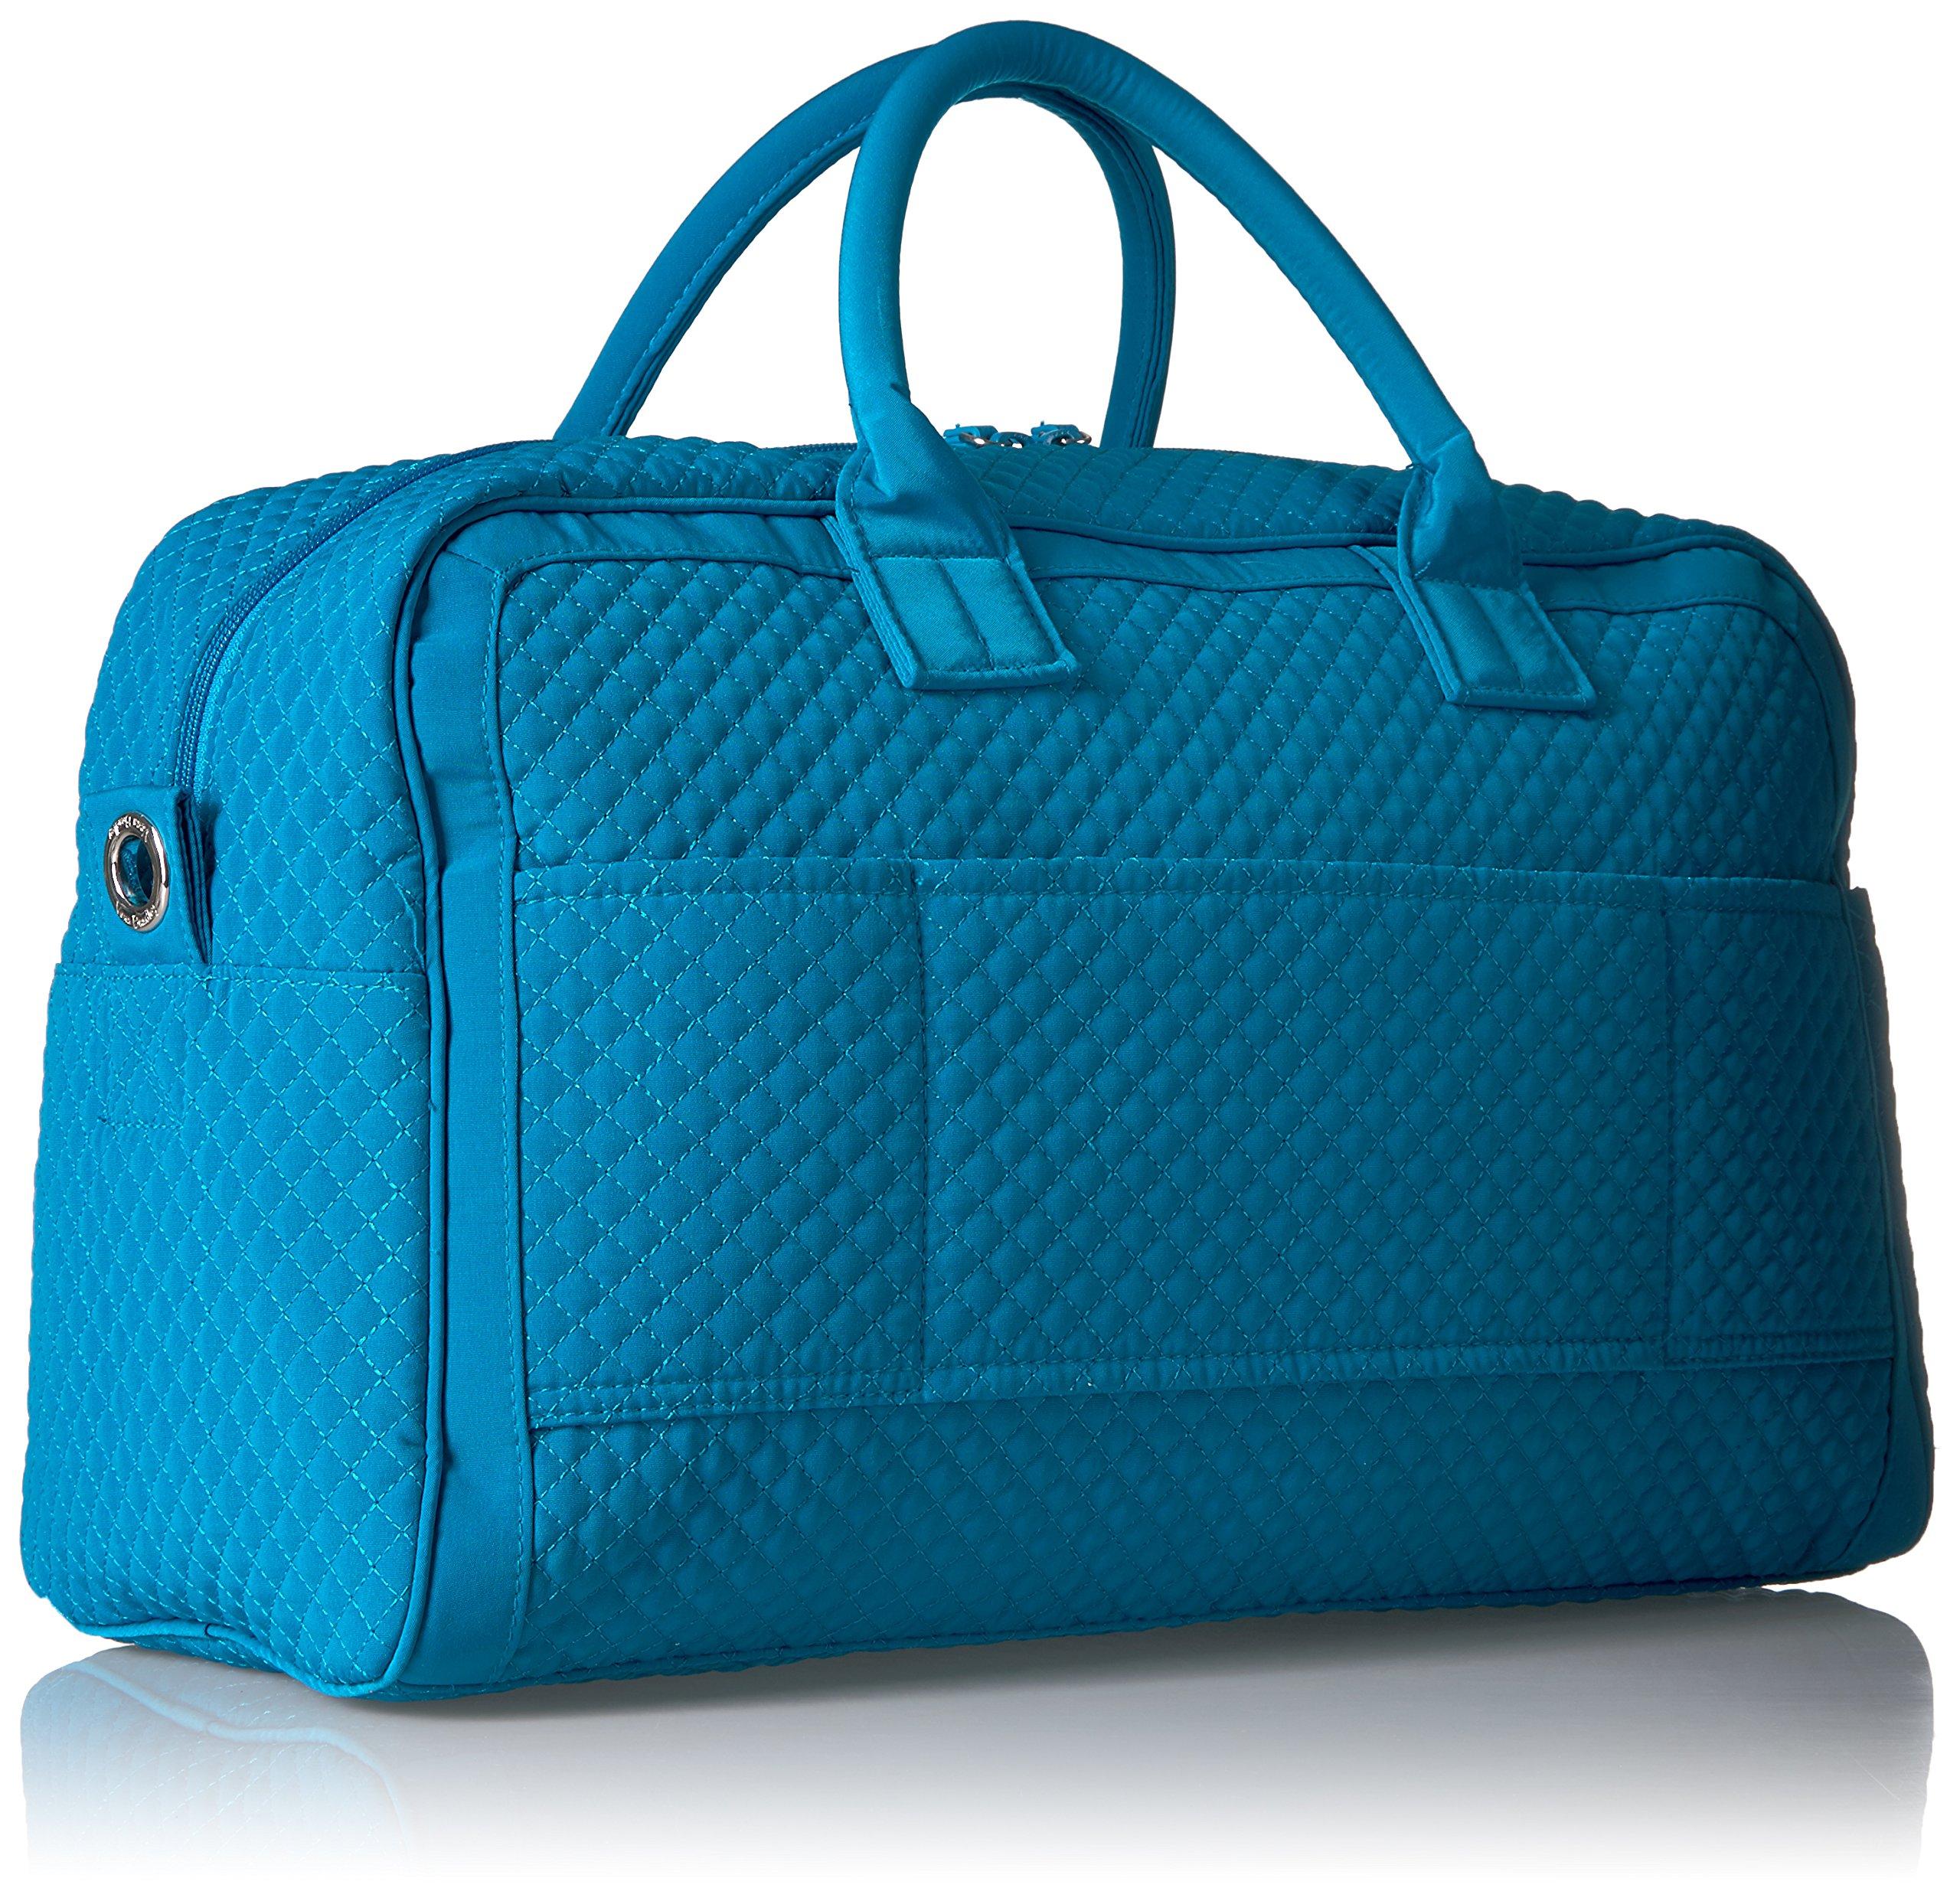 Vera Bradley Women's Iconic Compact Weekender Travel Bag Vera, Bahama Bay by Vera Bradley (Image #2)